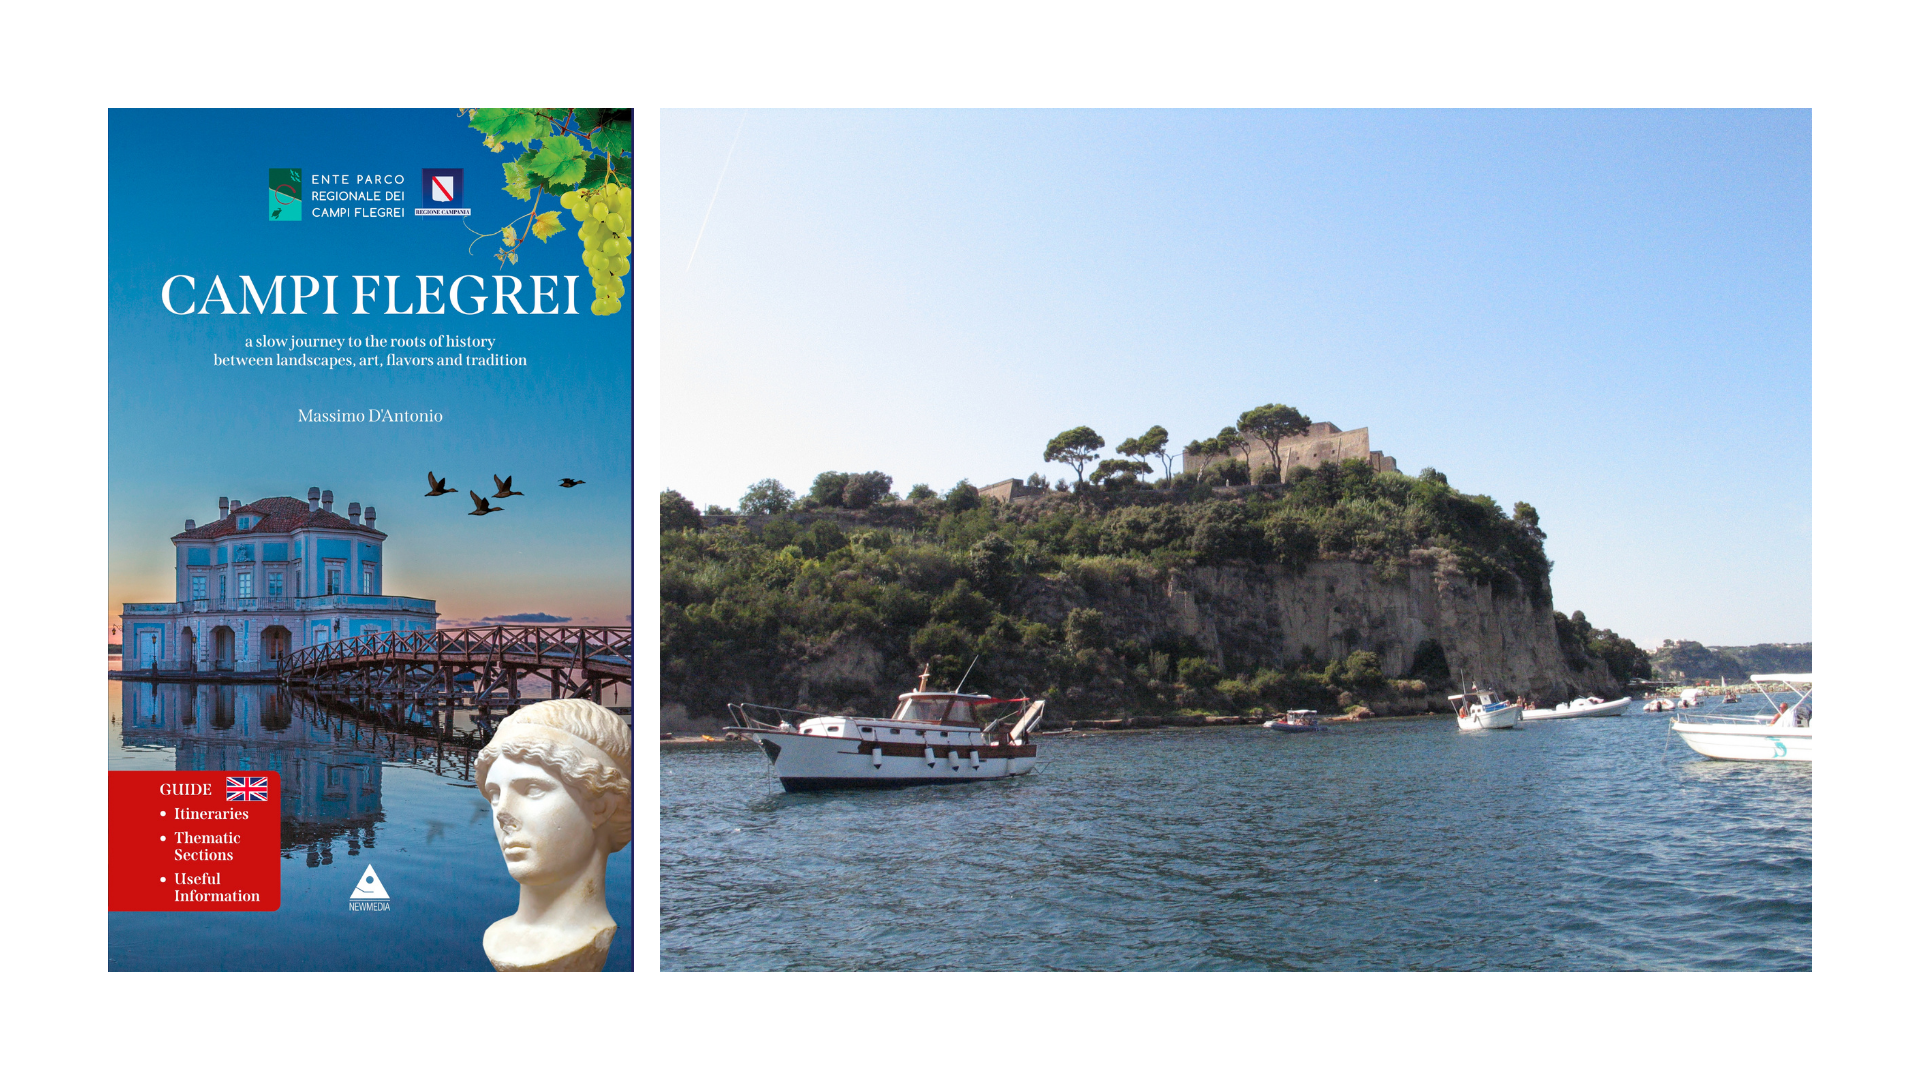 Presentazione Campi Flegrei Guida turistica